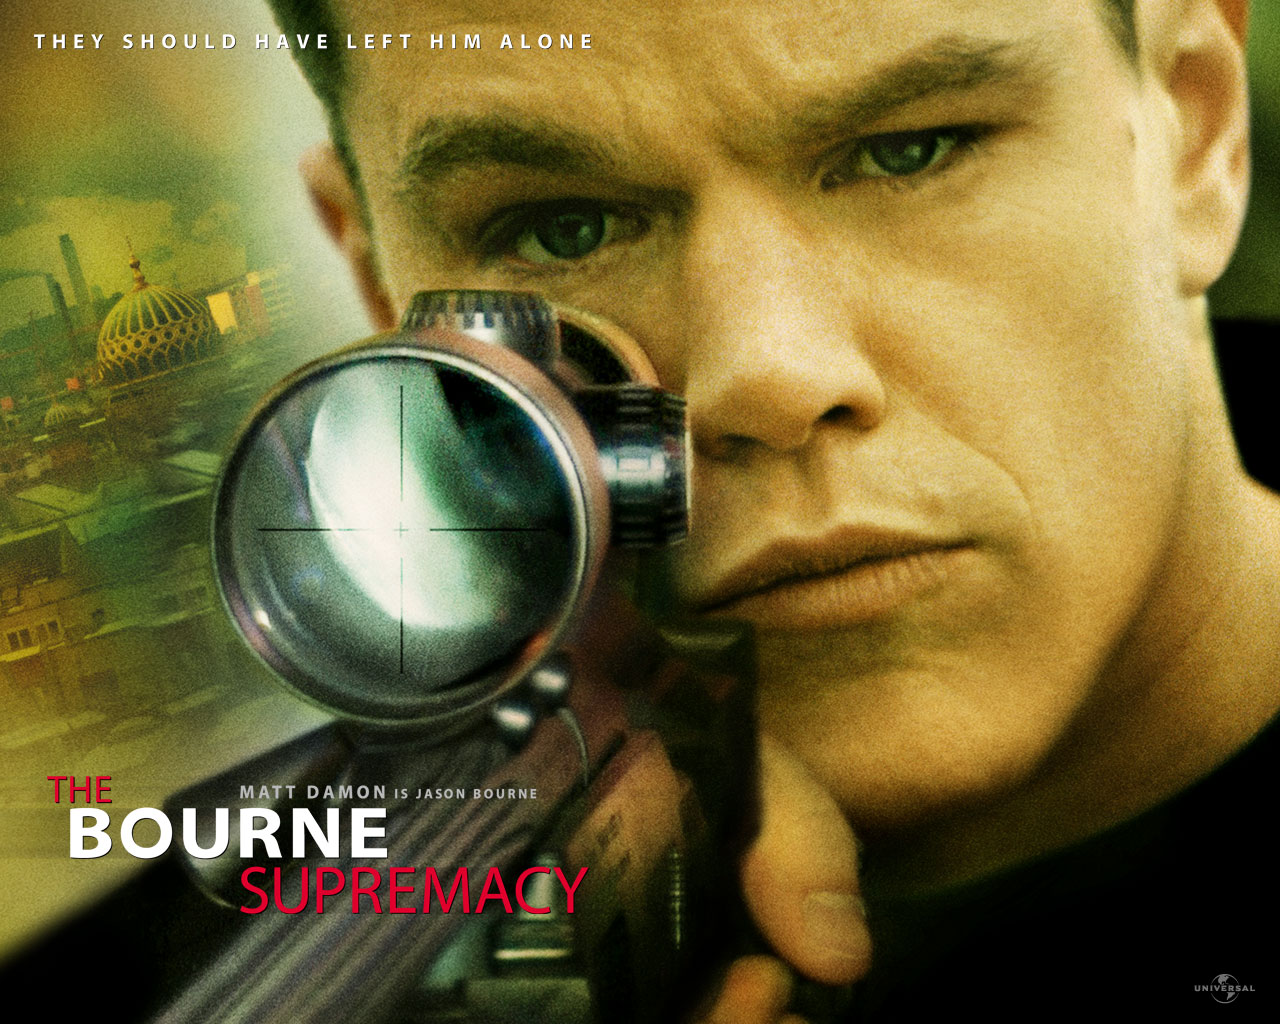 http://4.bp.blogspot.com/-LdAcwYowb6s/T_WPV1QfVBI/AAAAAAAACjI/1XjYh4IfuS4/s1600/The-Bourne-Supremacy-jason-bourne-223040_1280_1024.jpg